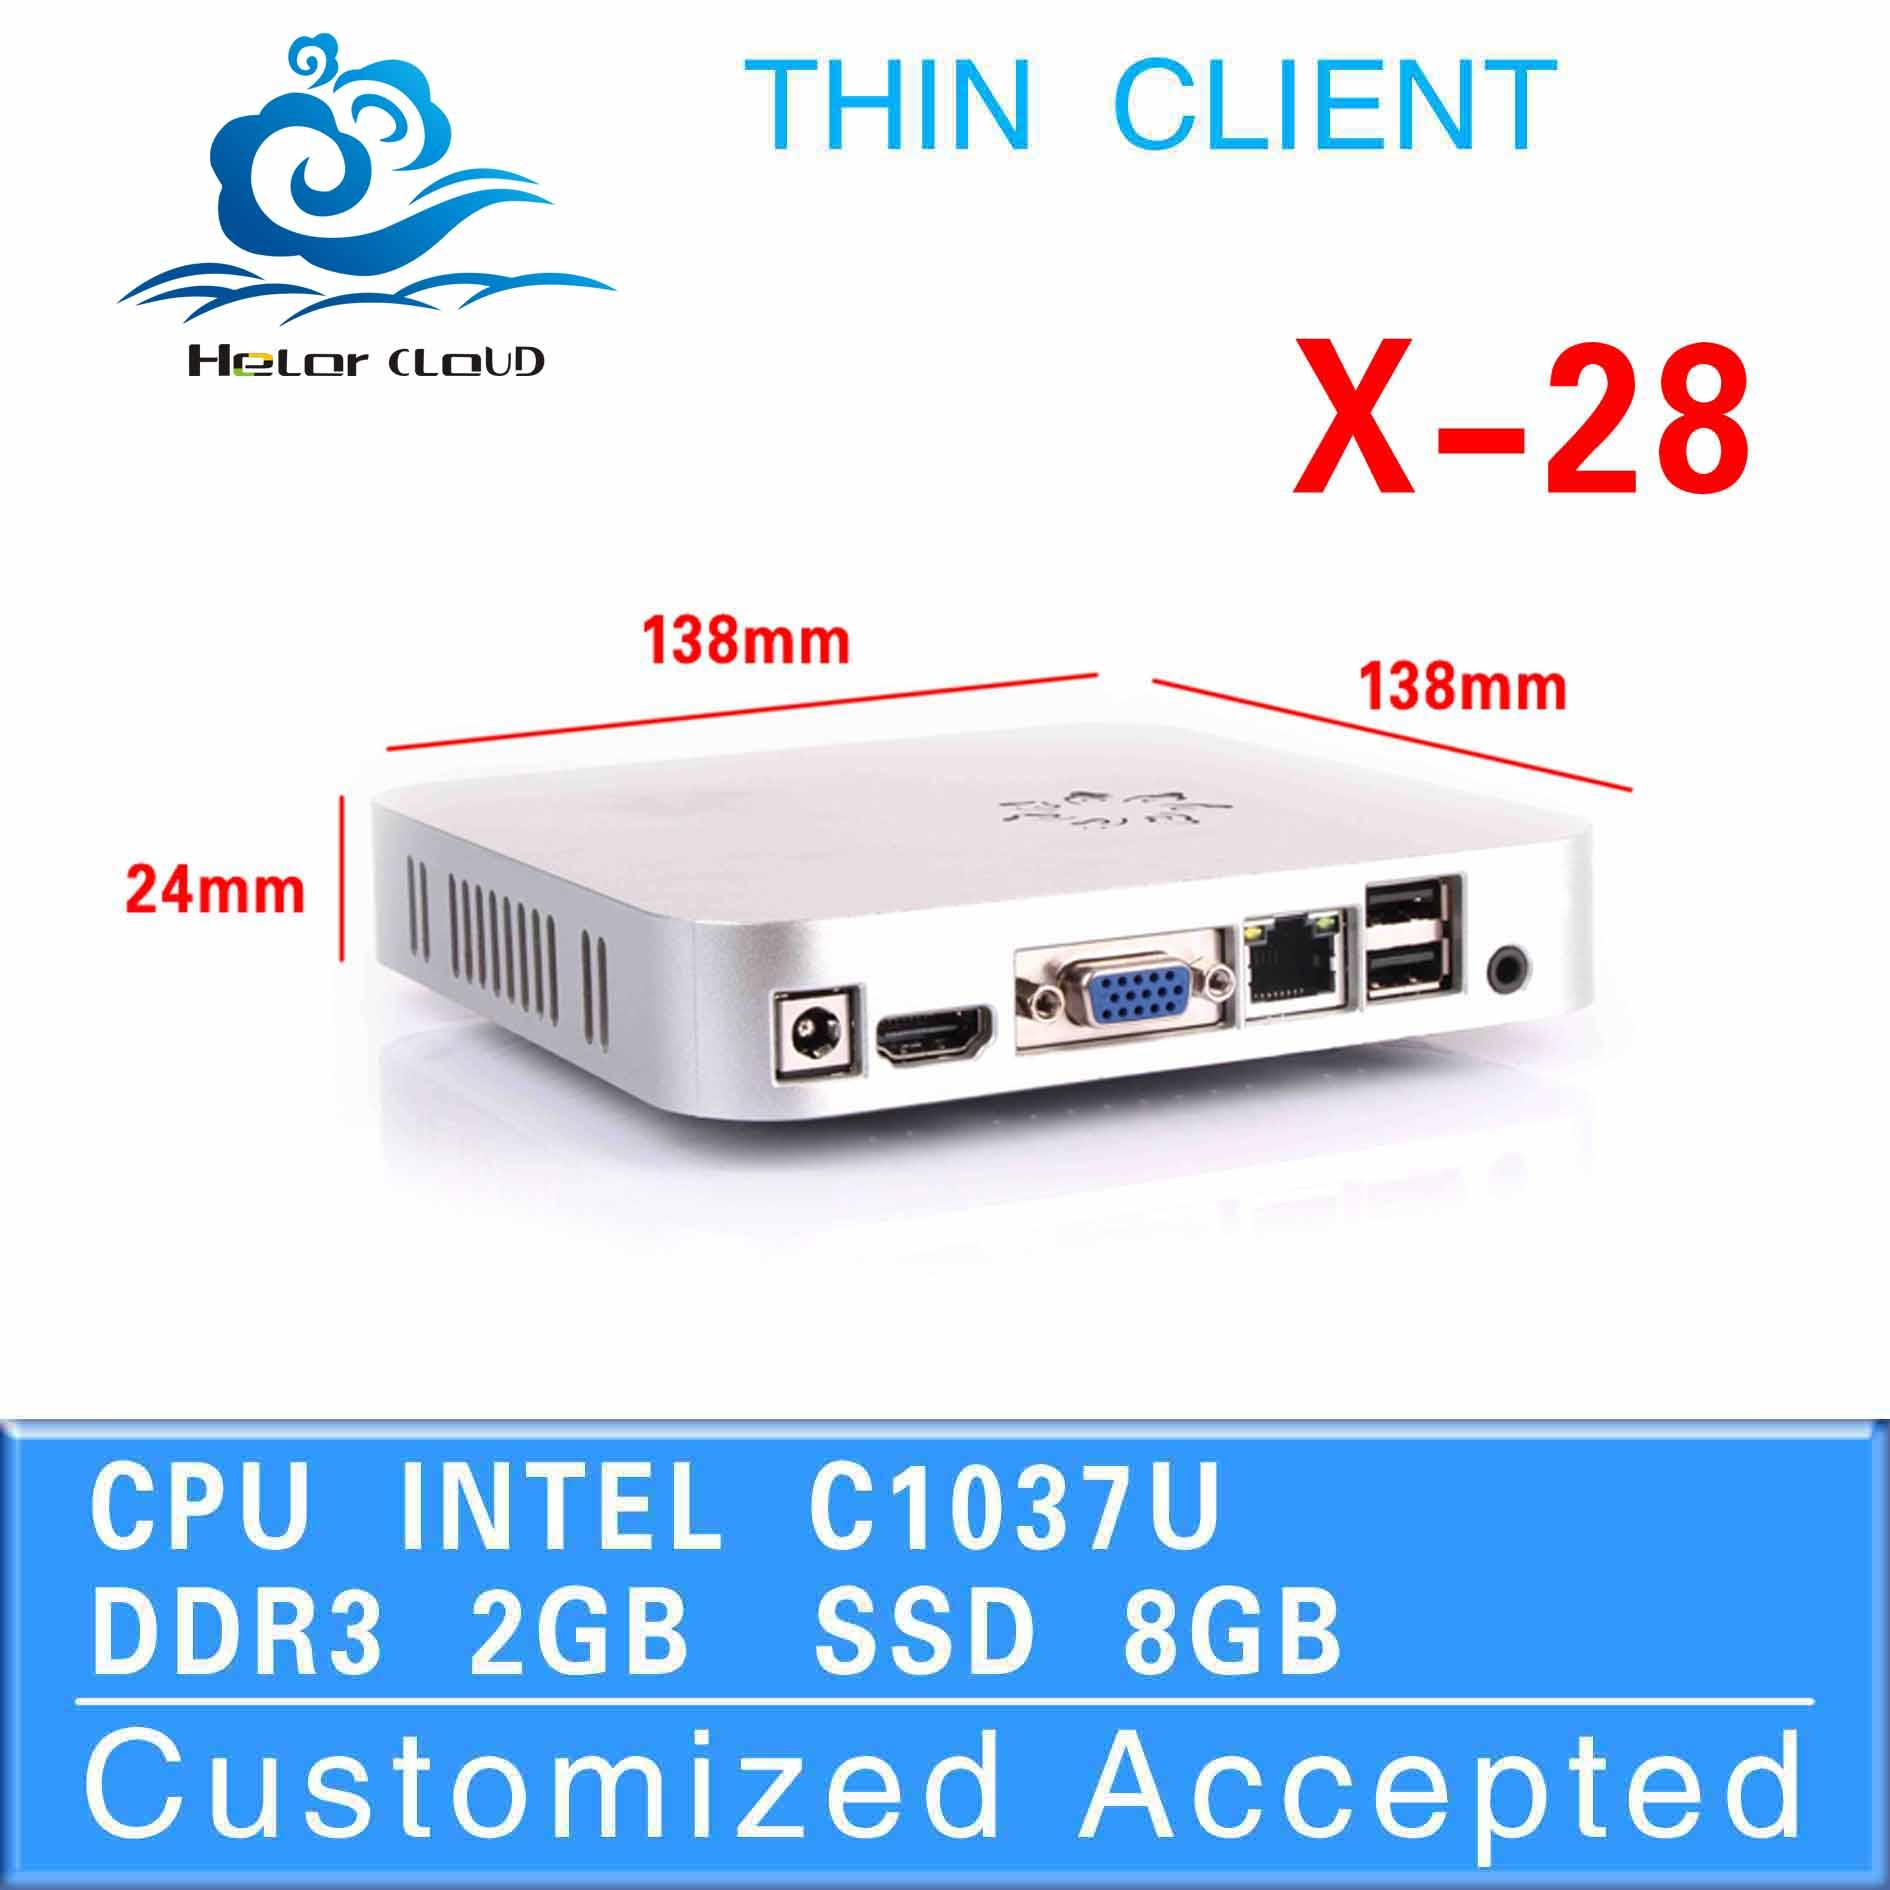 x-28 low price! fan diy pc fan thin client linux desktop pc (2GB RAM 8GB SSD 2*USB 2.0,1*HDMI 1.3,1*VGA)(China (Mainland))